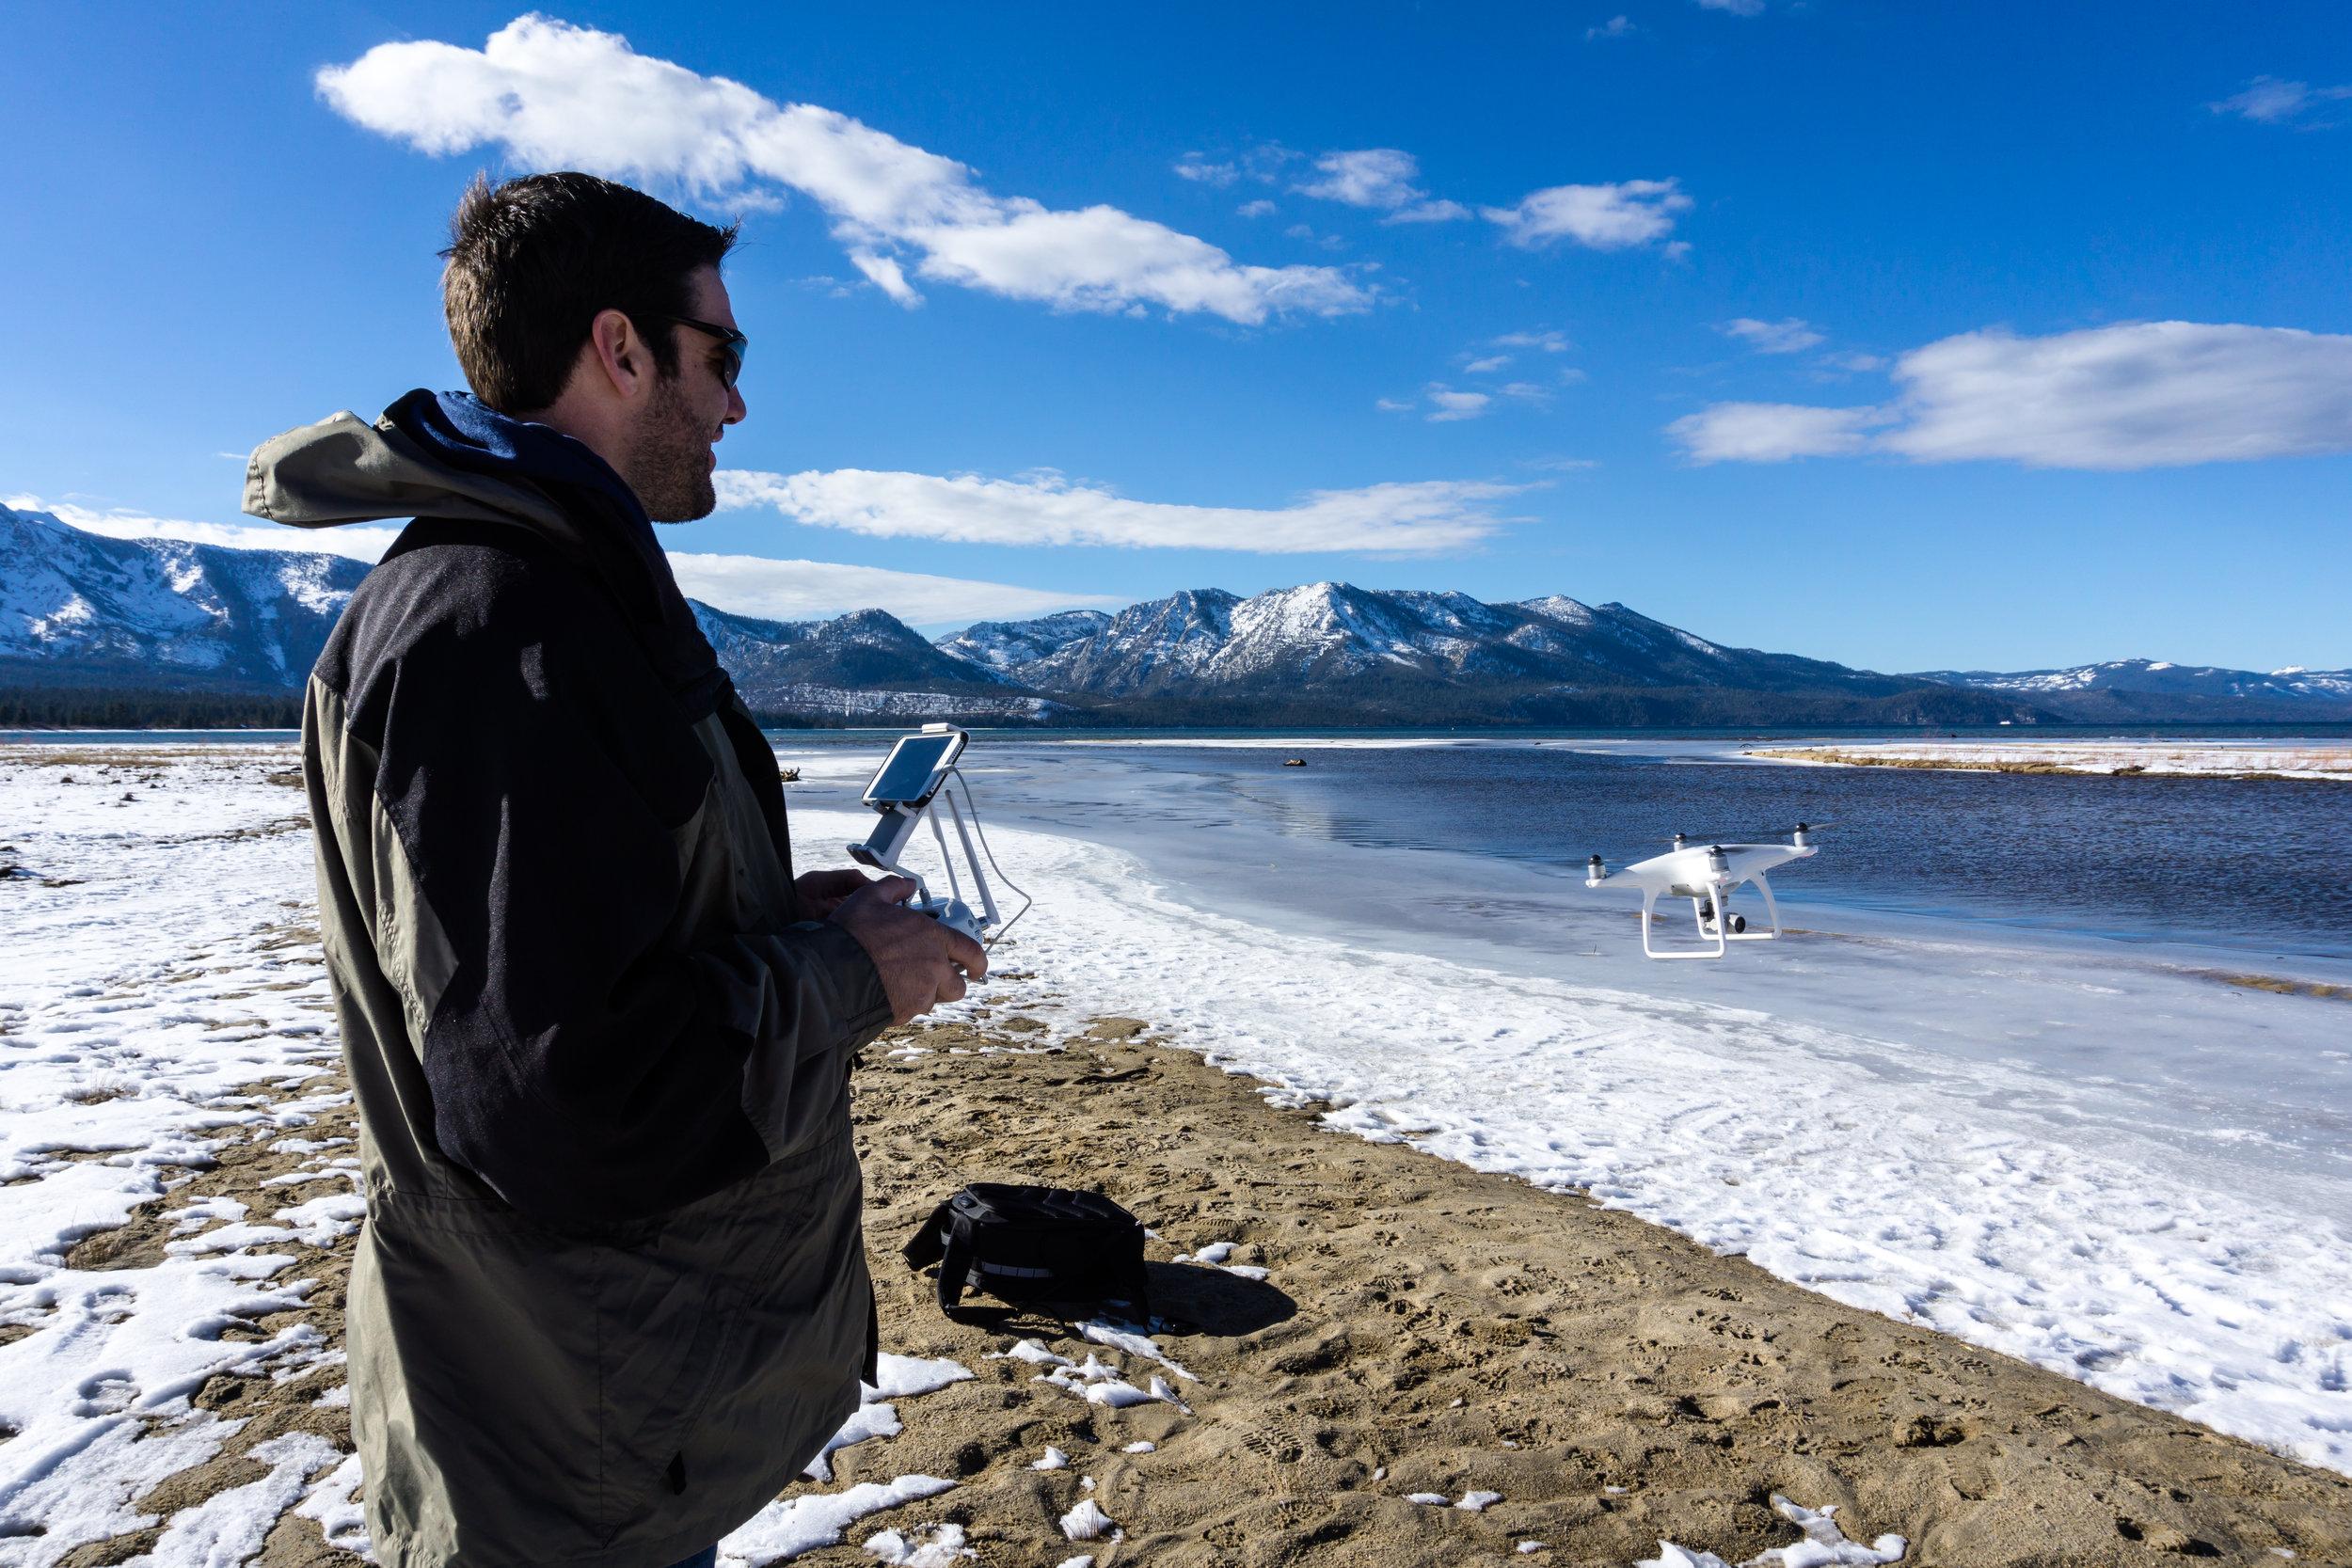 Flying a Phantom 4 on Lake Tahoe